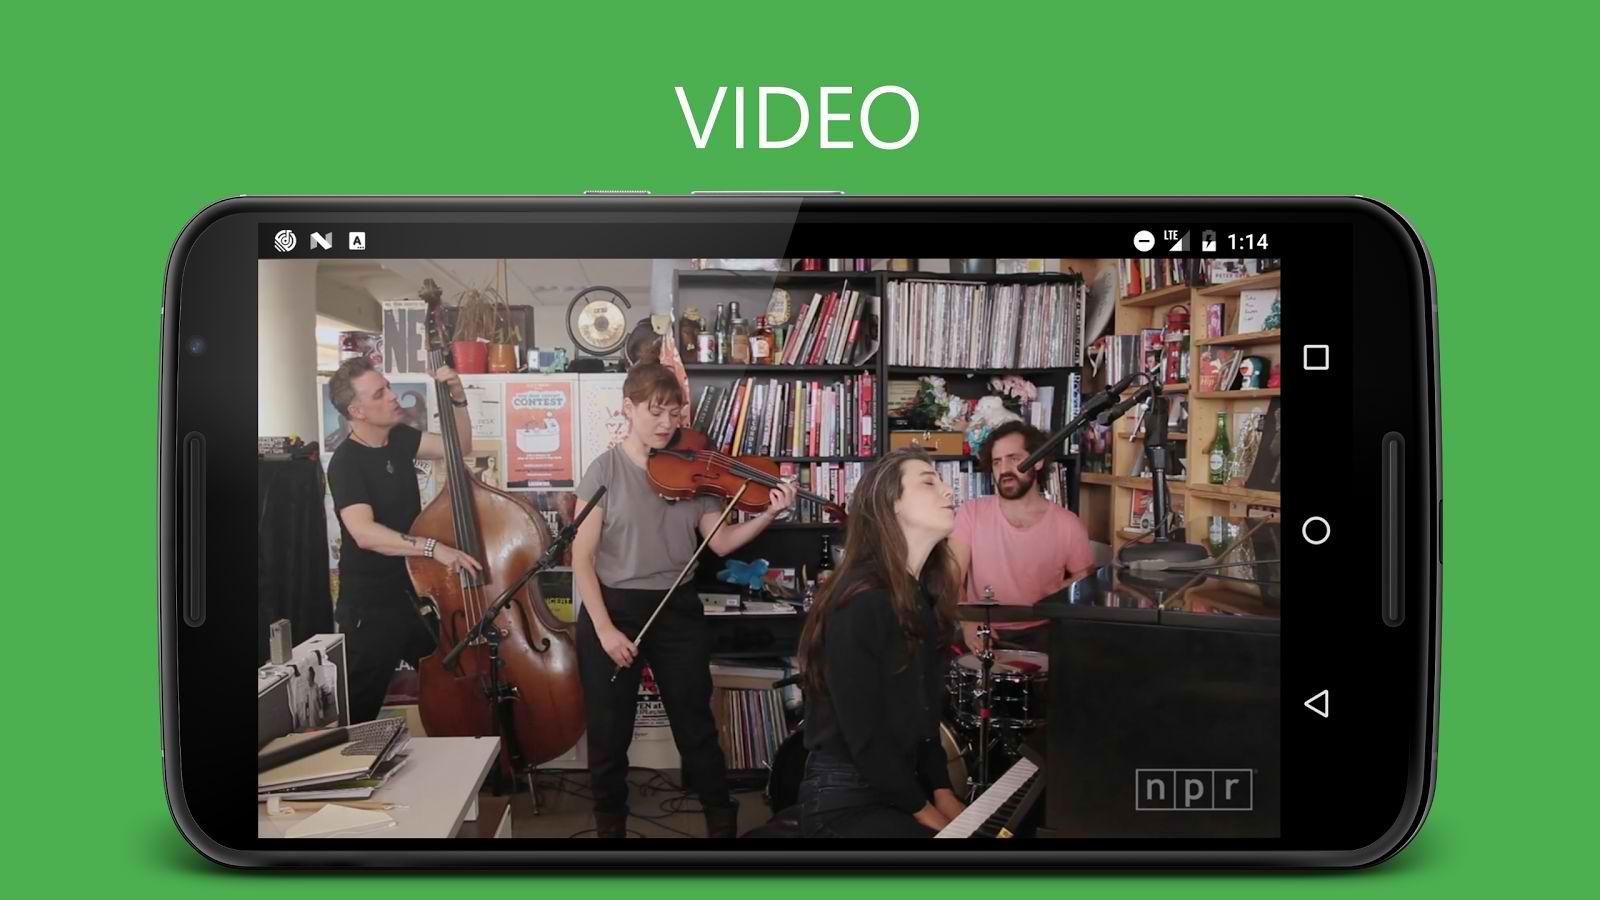 دانلود موزیک پلیر زیبای Pixel Music Player + اندروید - Pixel+ - Music Player